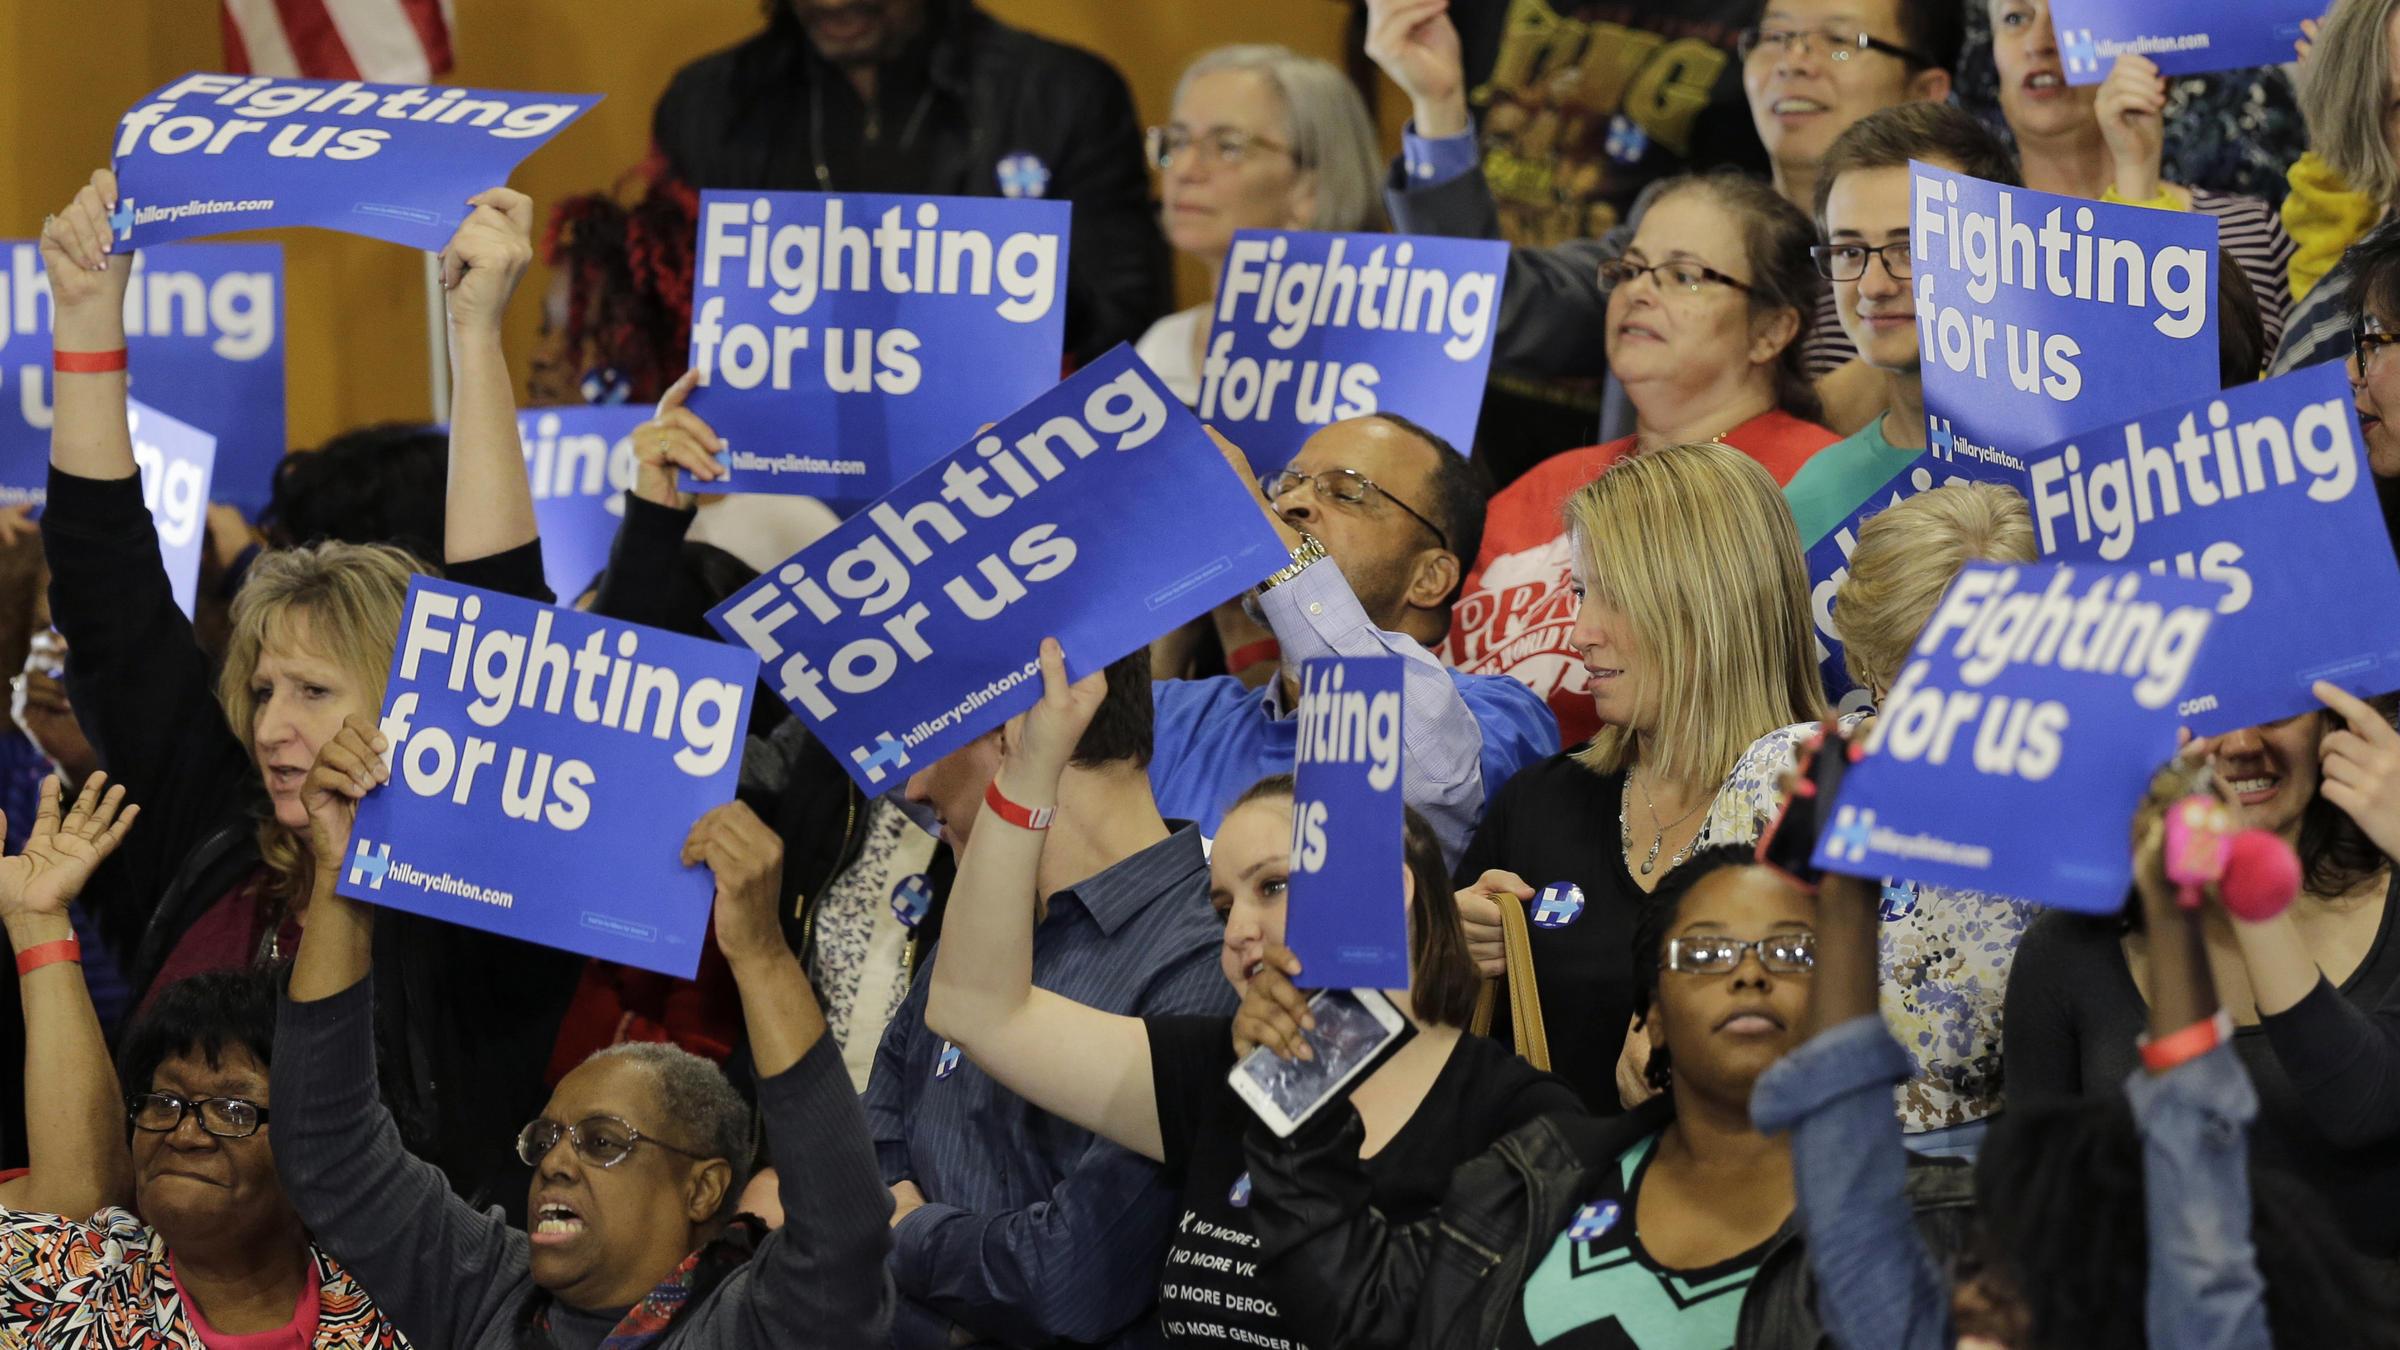 Trump leads Rubio in Florida, Kasich in Ohio